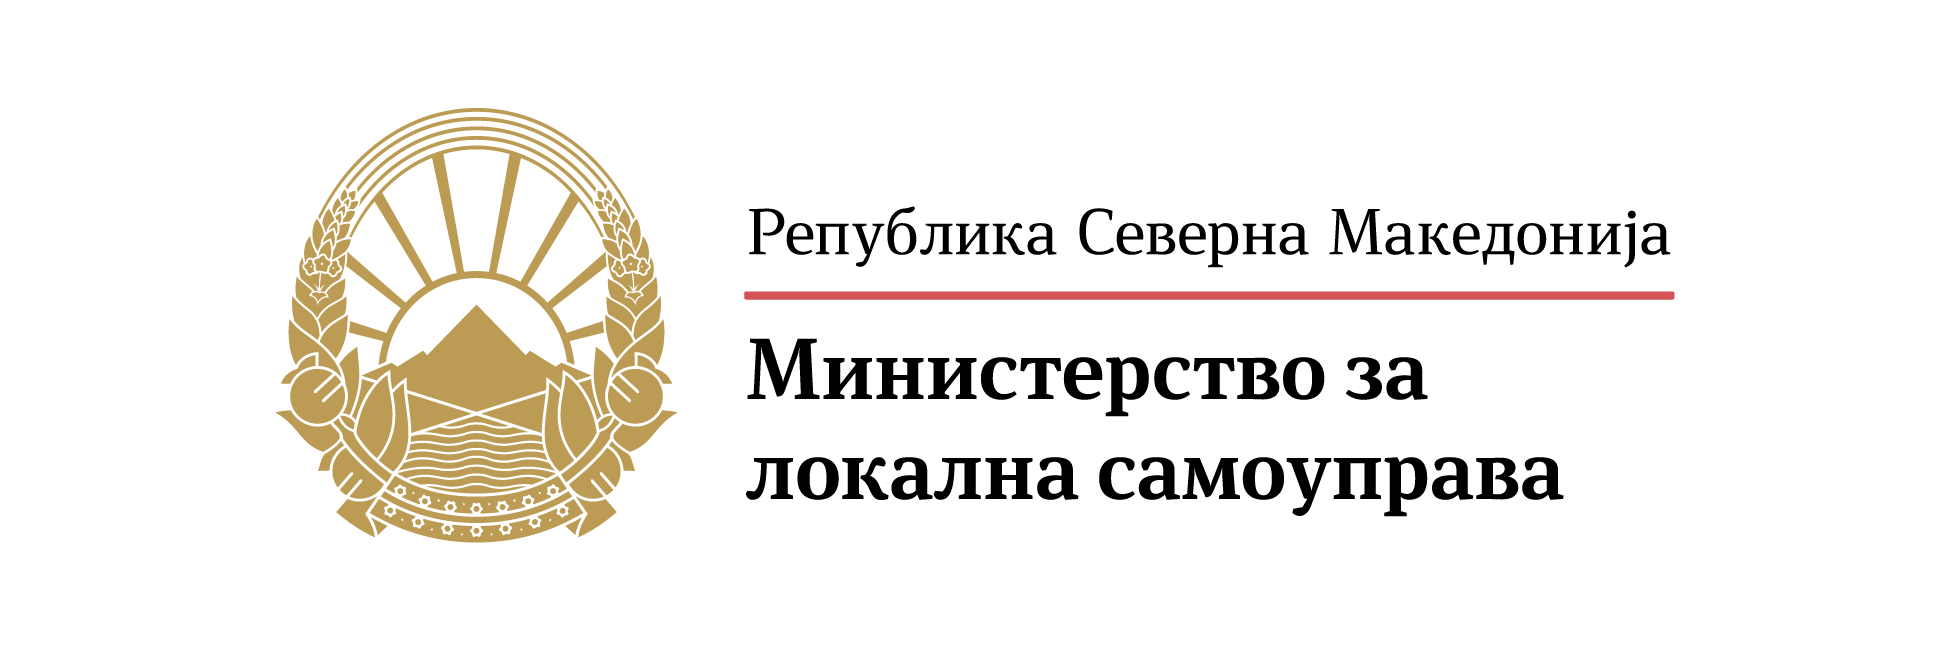 Ministerstvo za lokalna samouprava